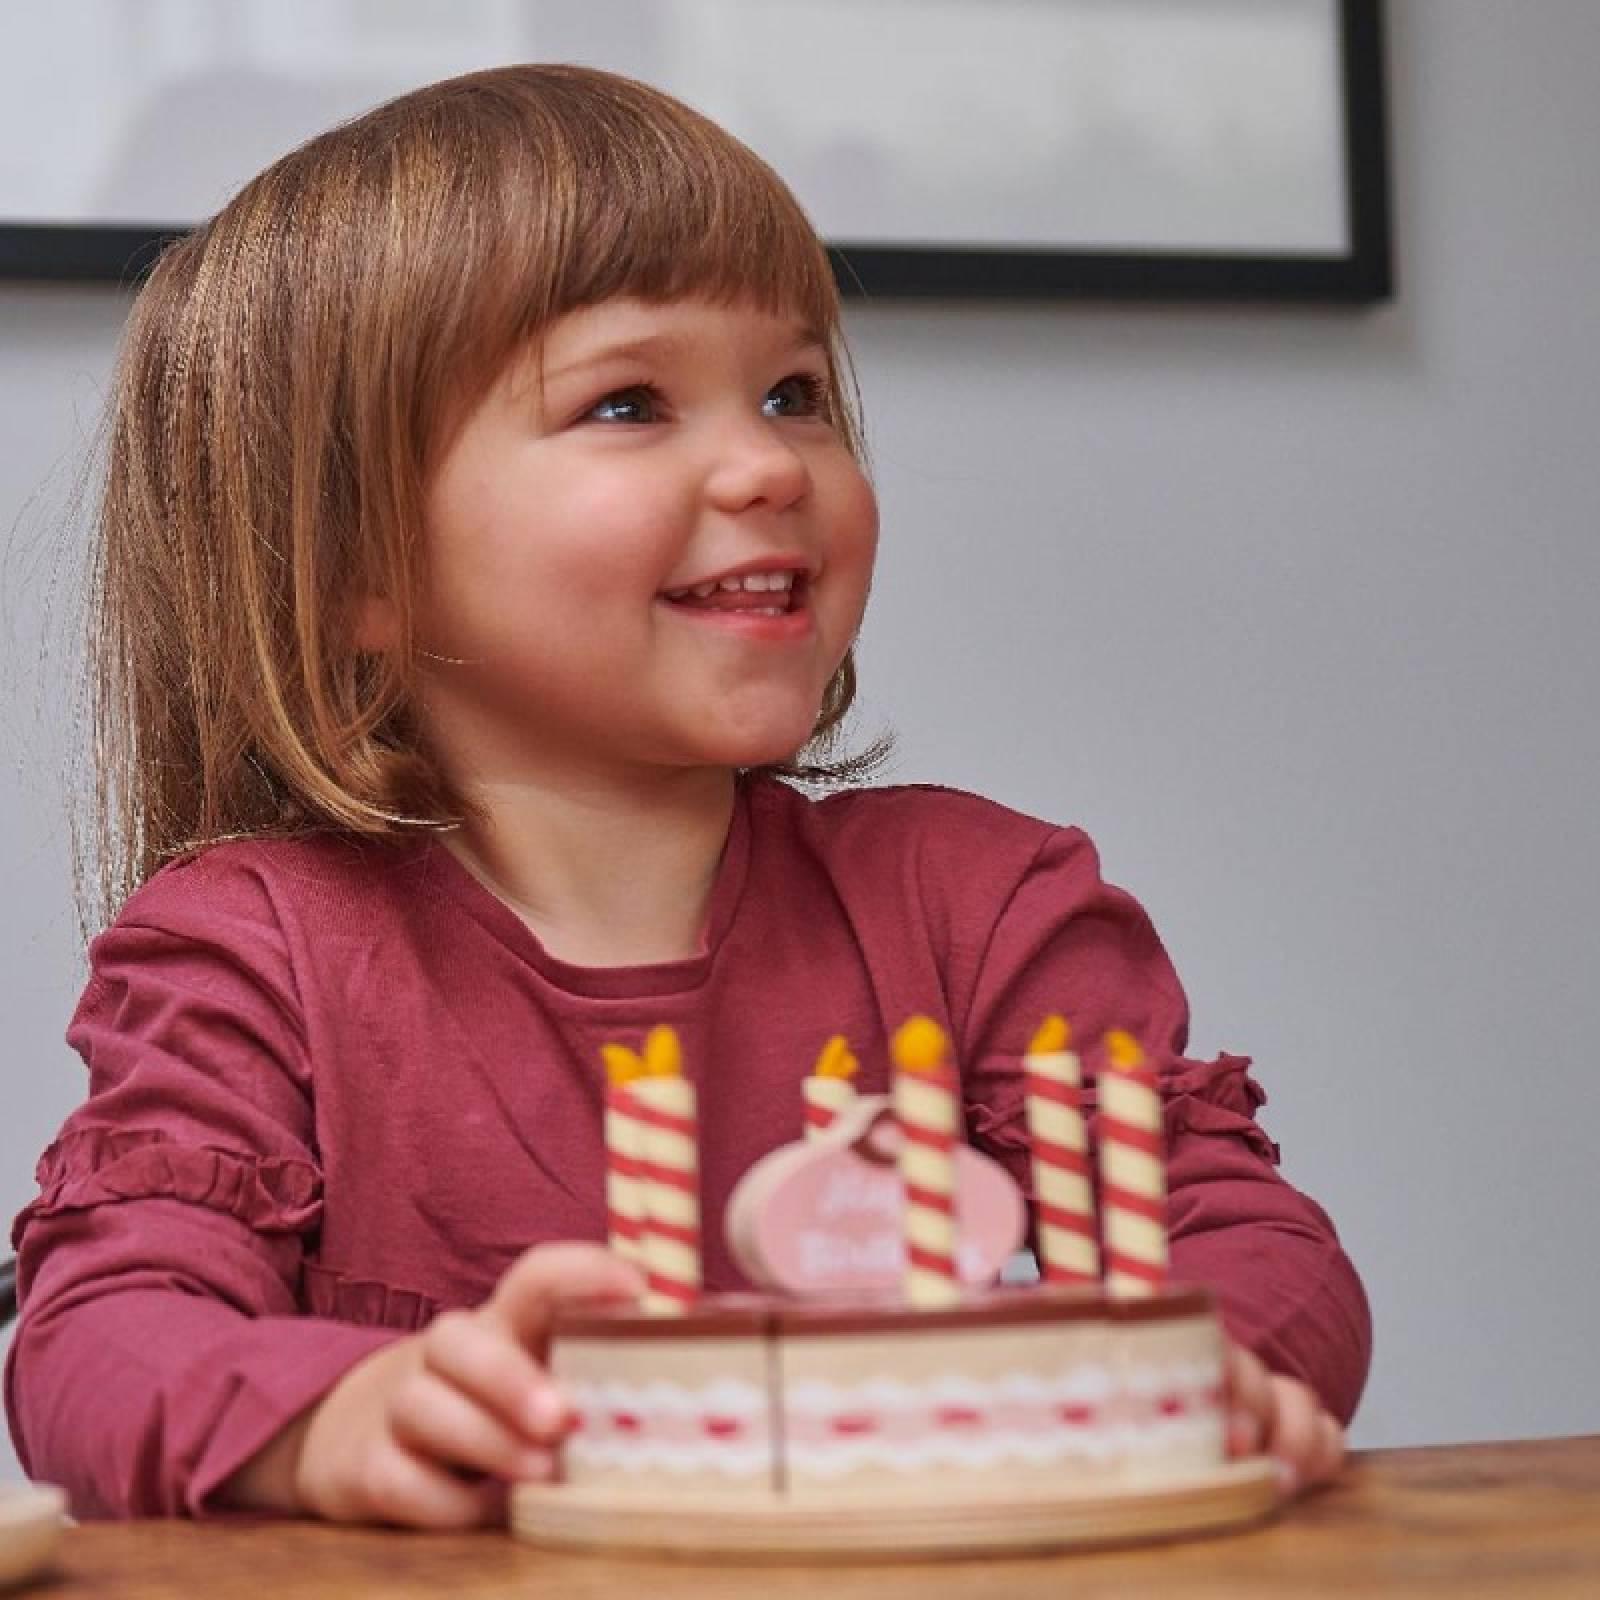 Chocolate Birthday Cake Wooden Play Food Set 3+ thumbnails